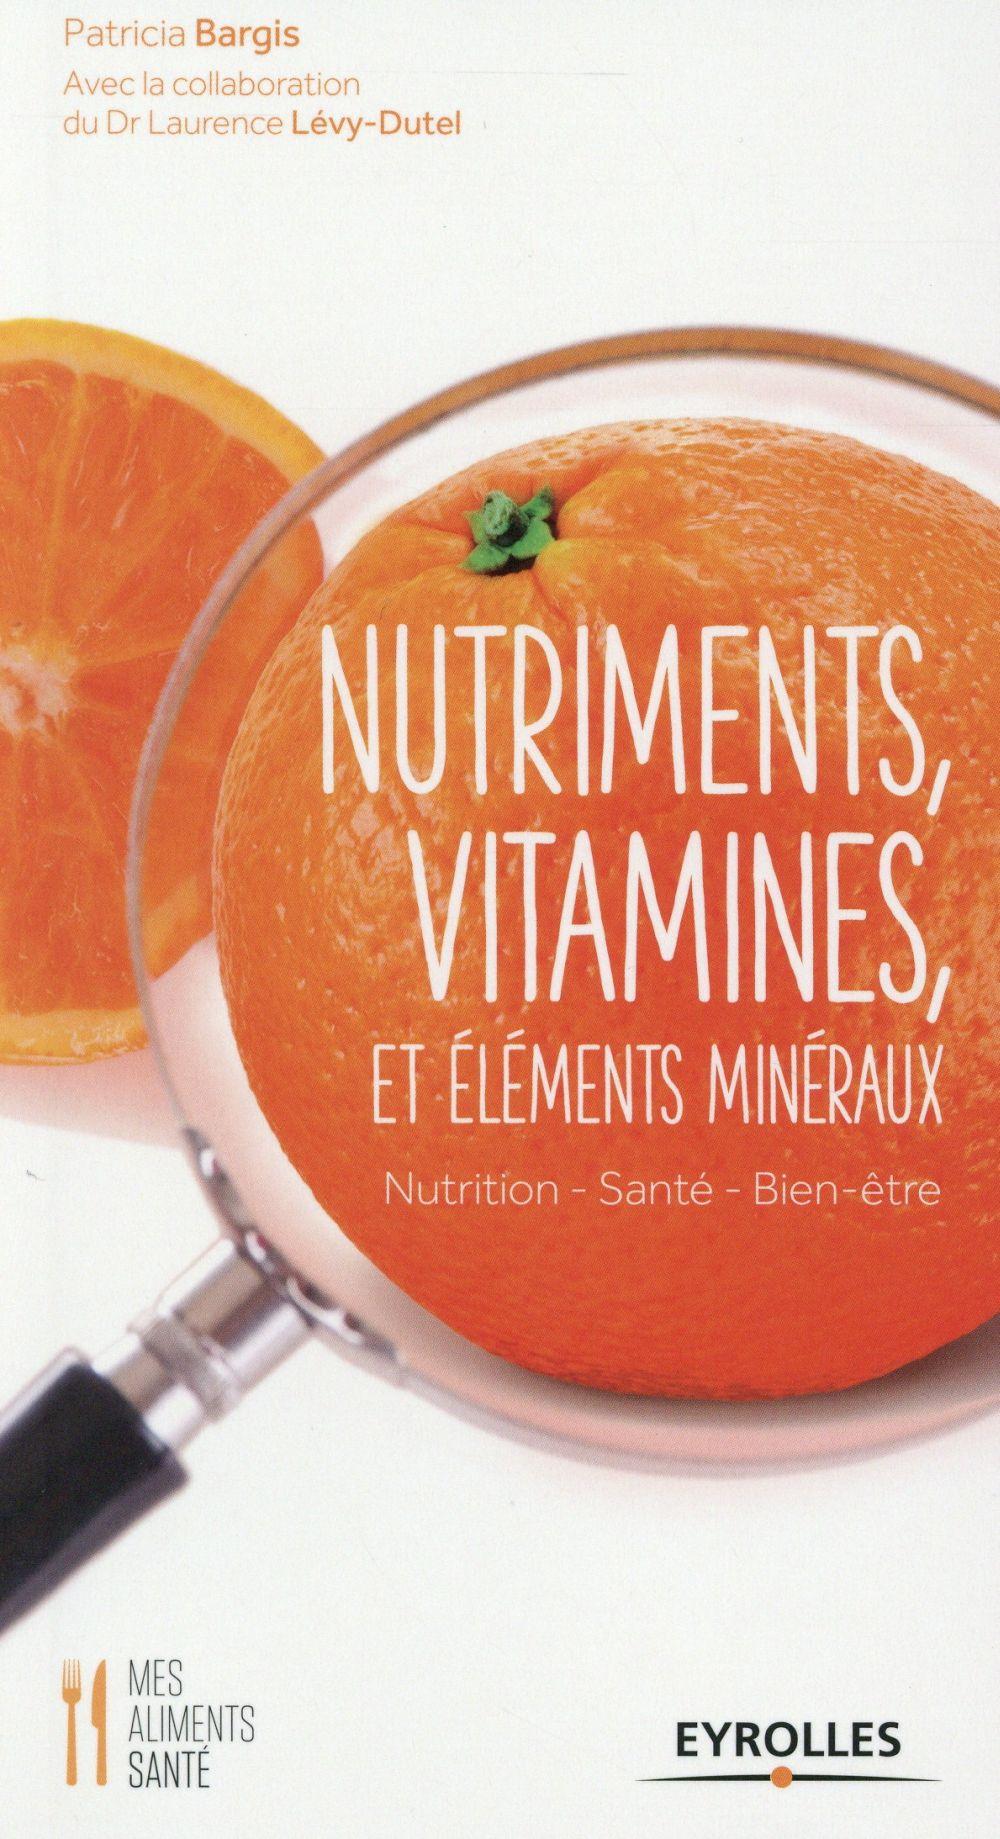 NUTRIMENTS VITAMINES ET ELEMENTS MINERAUX